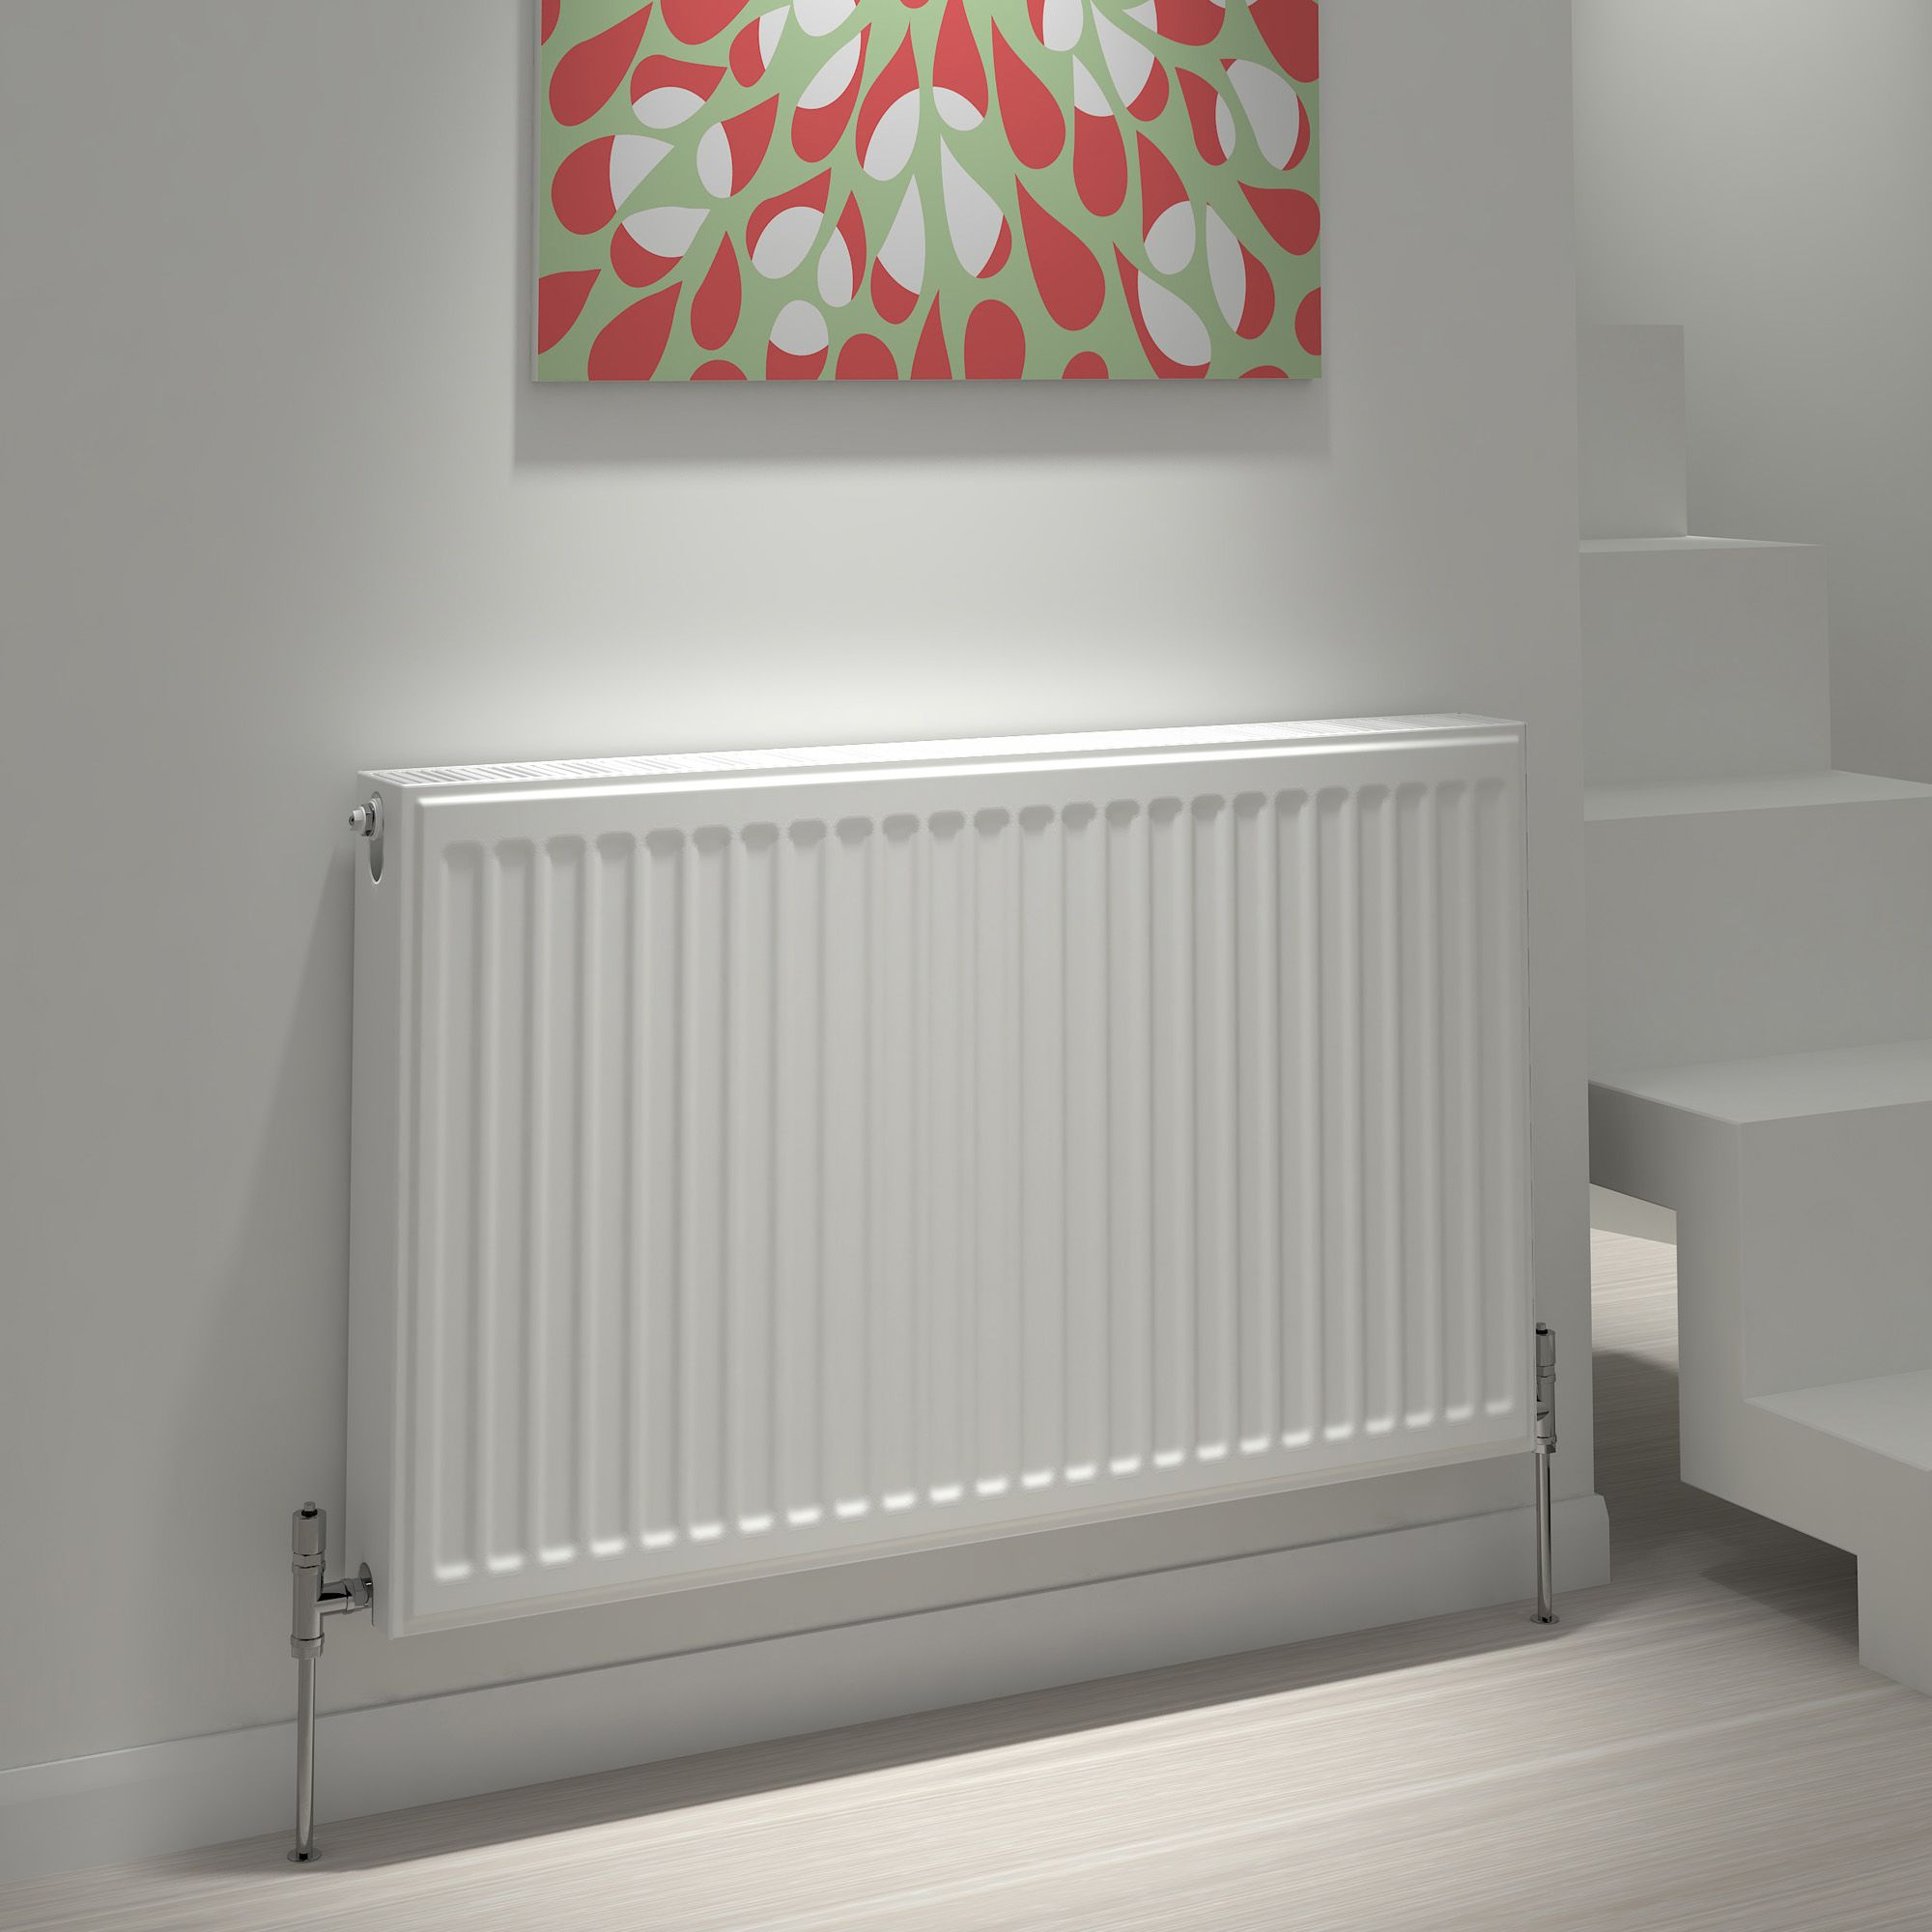 Kudox Type 11 single Panel radiator White, (H)600mm